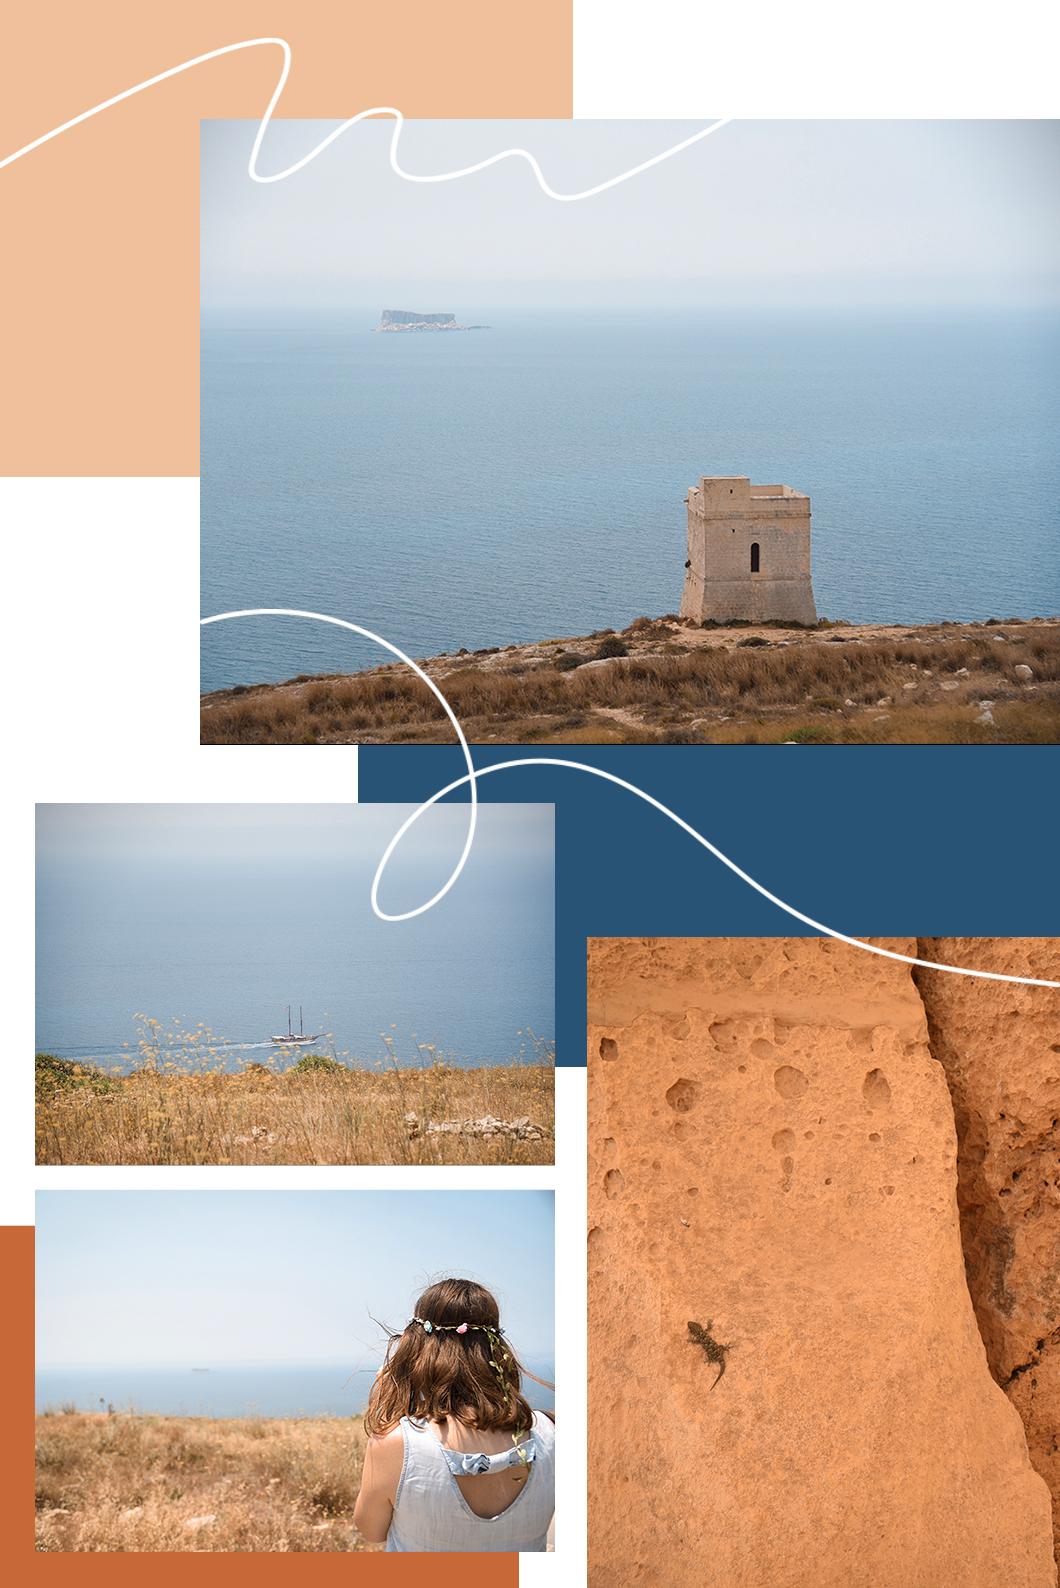 Hagar Qim et Minajora, visites incontournables à Malte